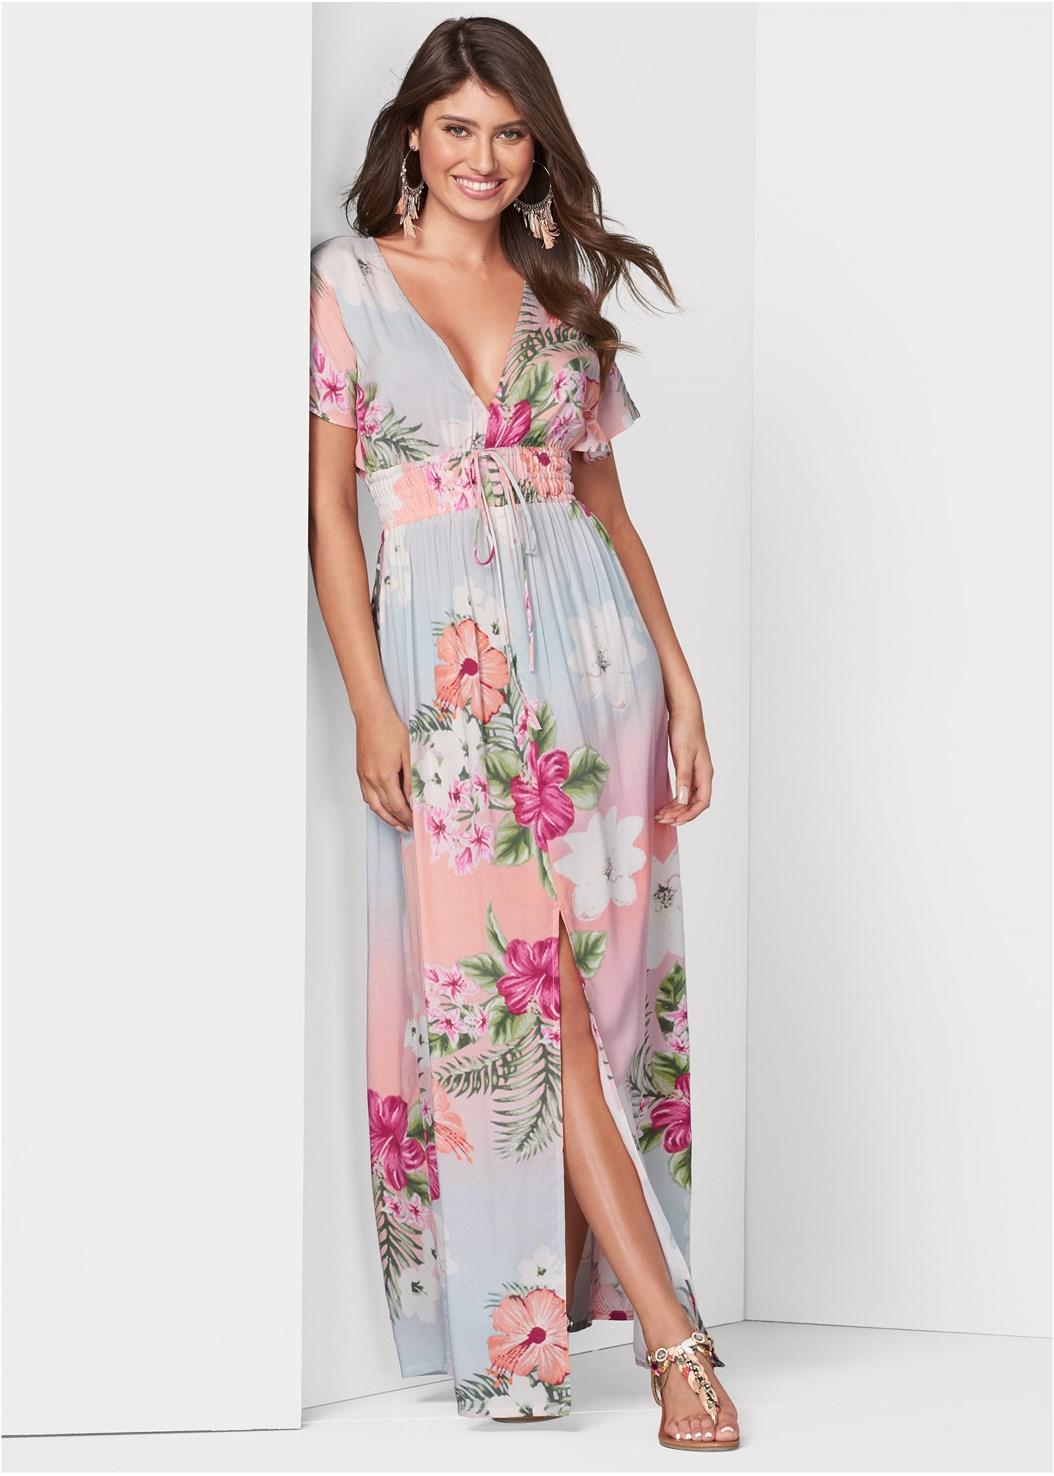 Floral Maxi Dress,Naked T-Shirt Bra,Oversized Tassel Earrings,Circular Straw Bag